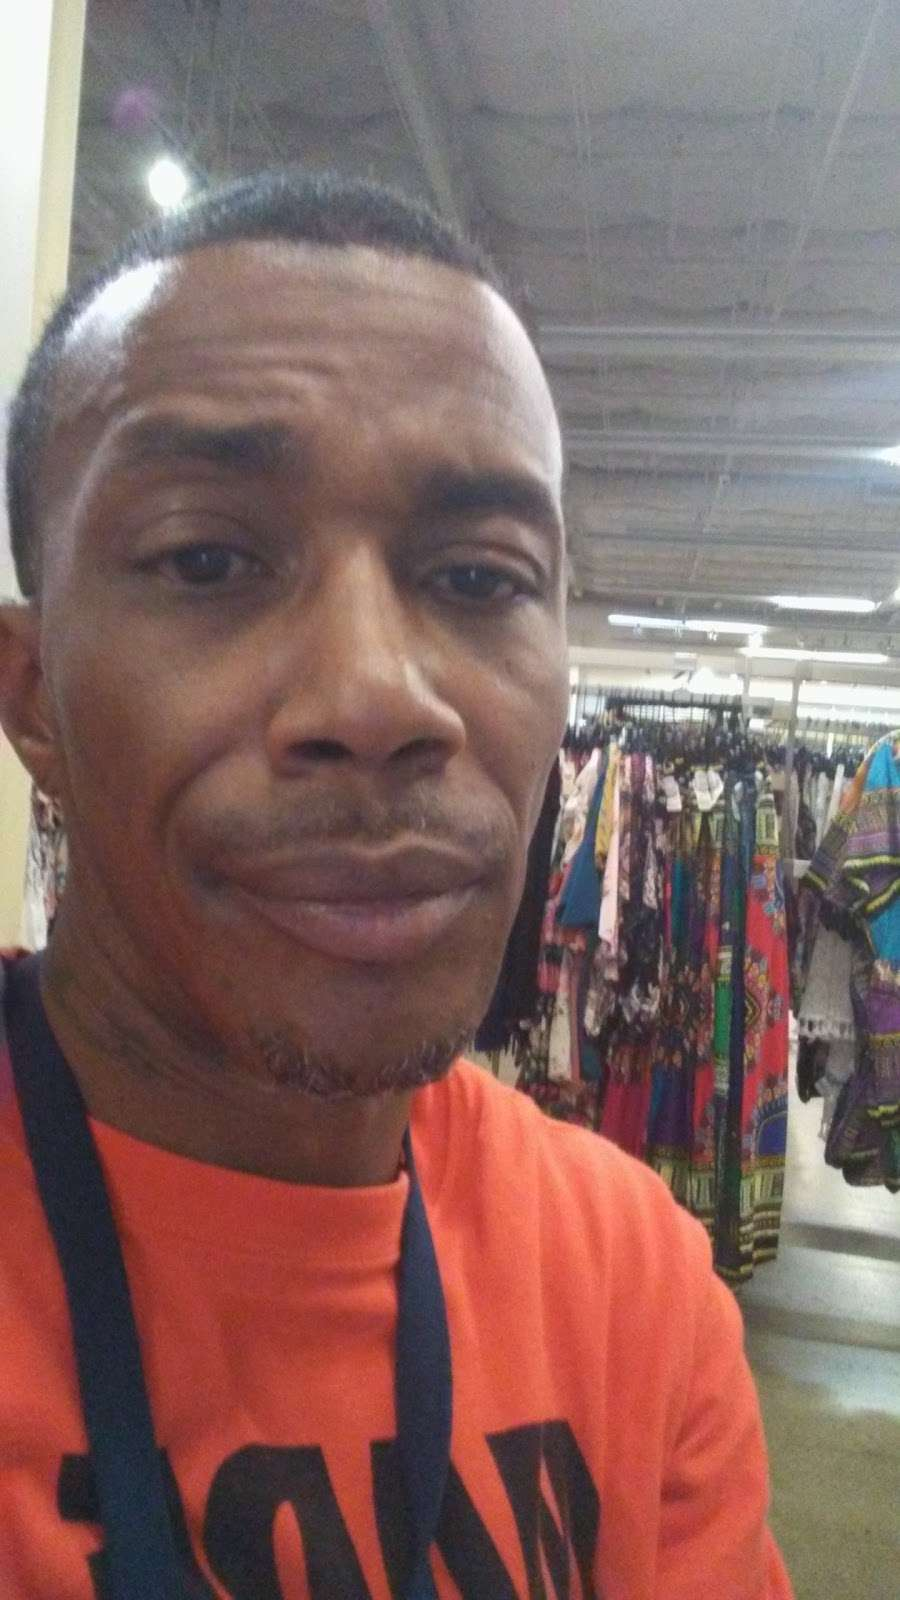 Rainbow - shoe store  | Photo 3 of 8 | Address: 3662 W Camp Wisdom Rd, Dallas, TX 75237, USA | Phone: (972) 709-1536